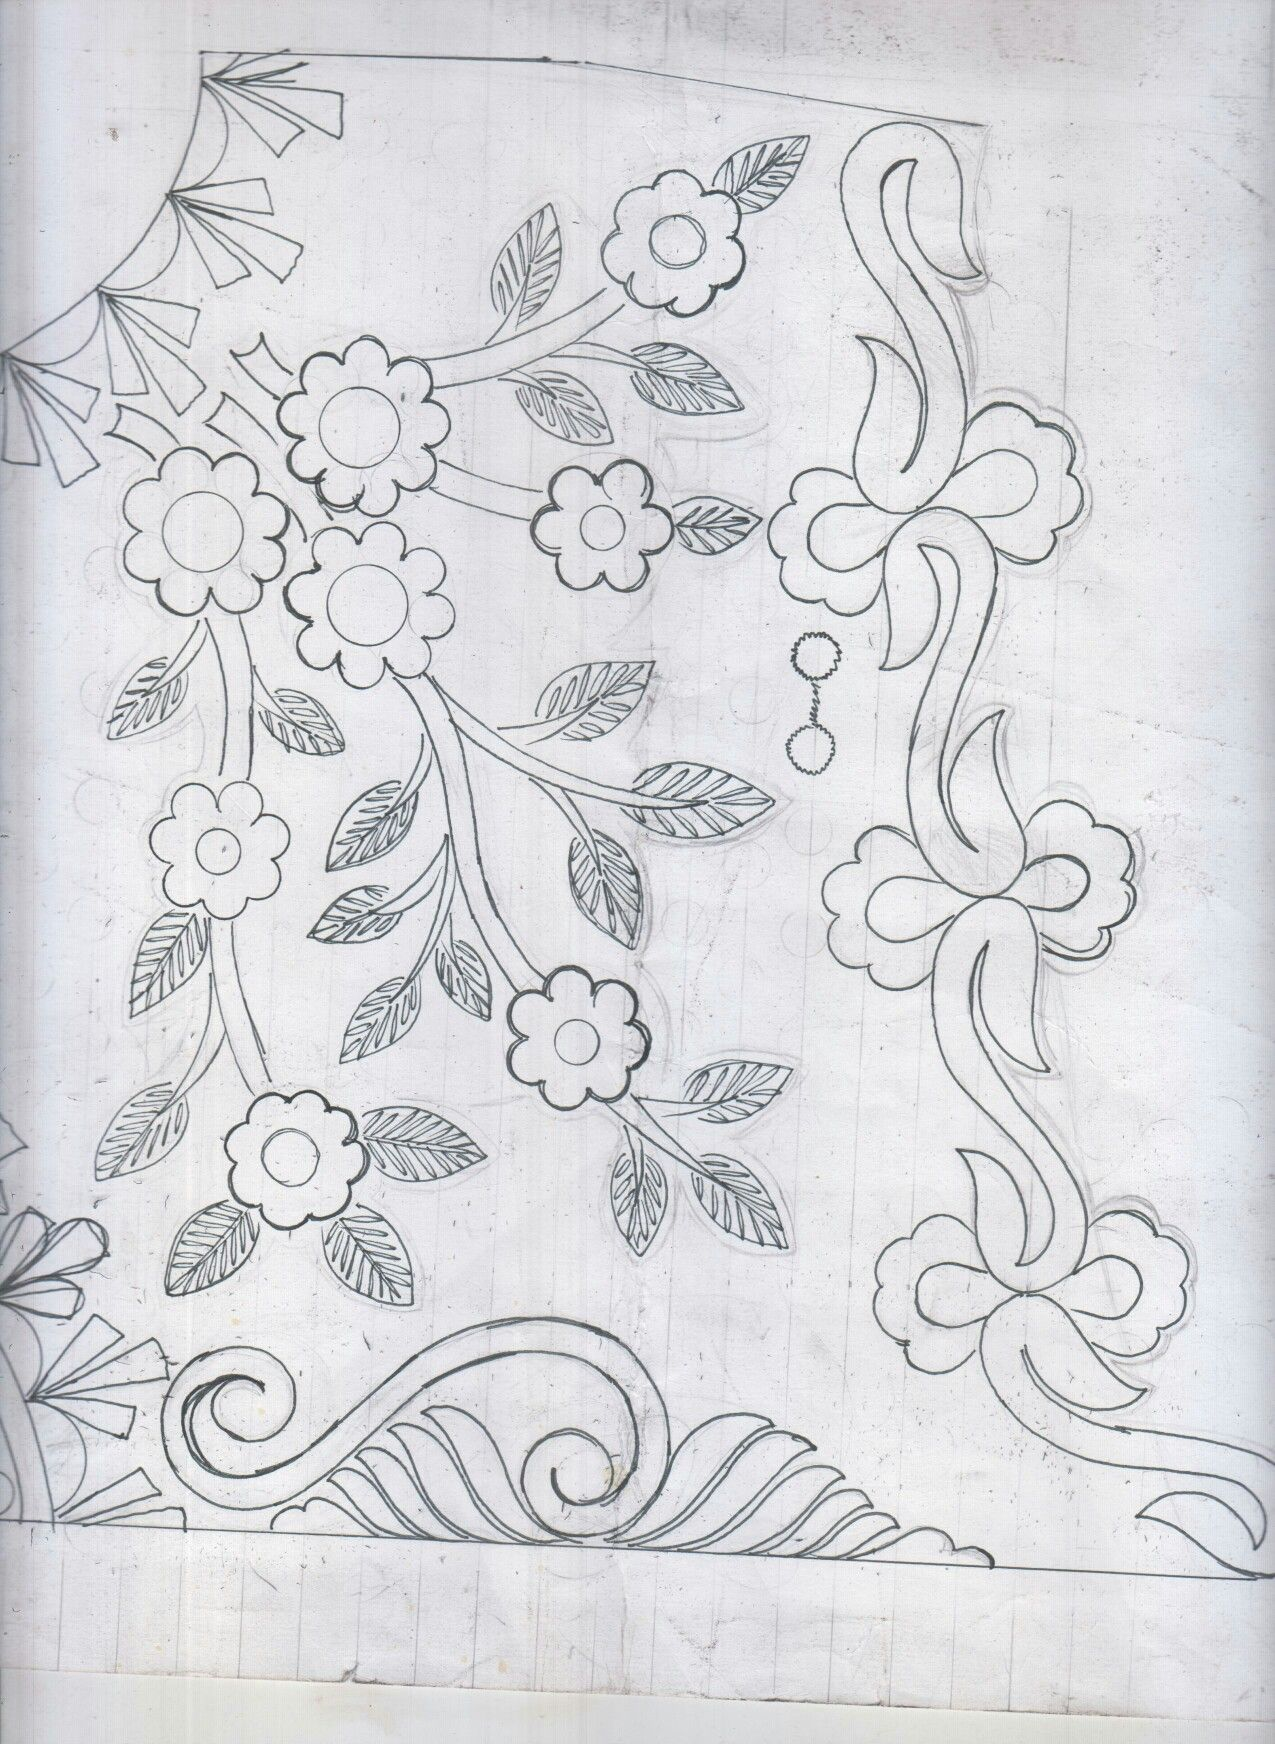 Pin By Baldev Gevariya On Design Sketches Embroidery Designs Machine Embroidery Irish Crochet Motifs